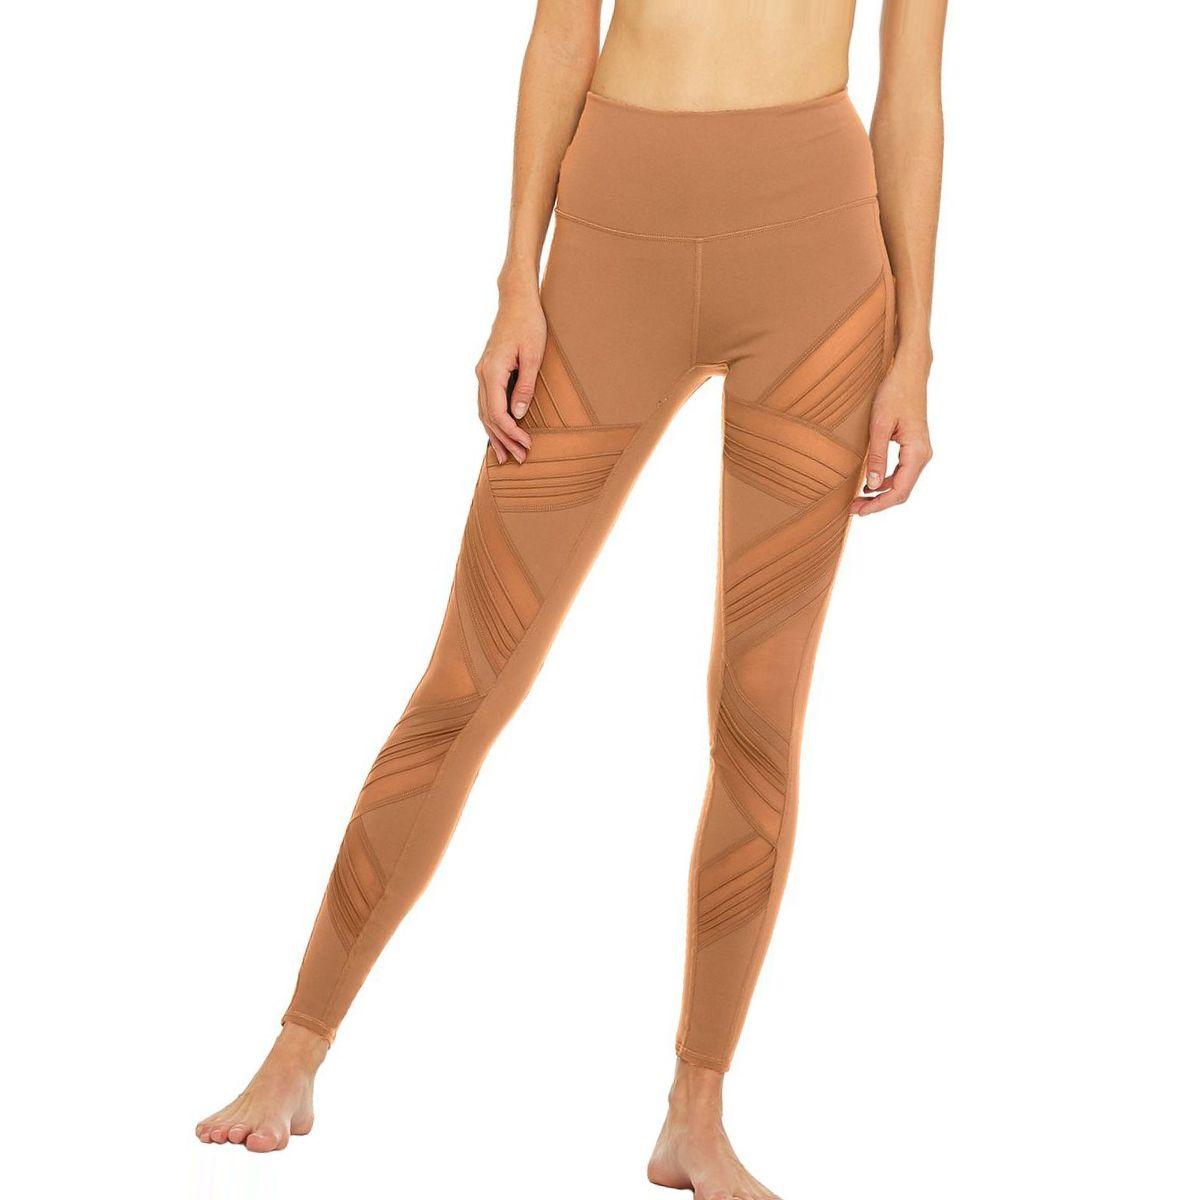 Alo Yoga Ultimate High-Waist Legging - Women's